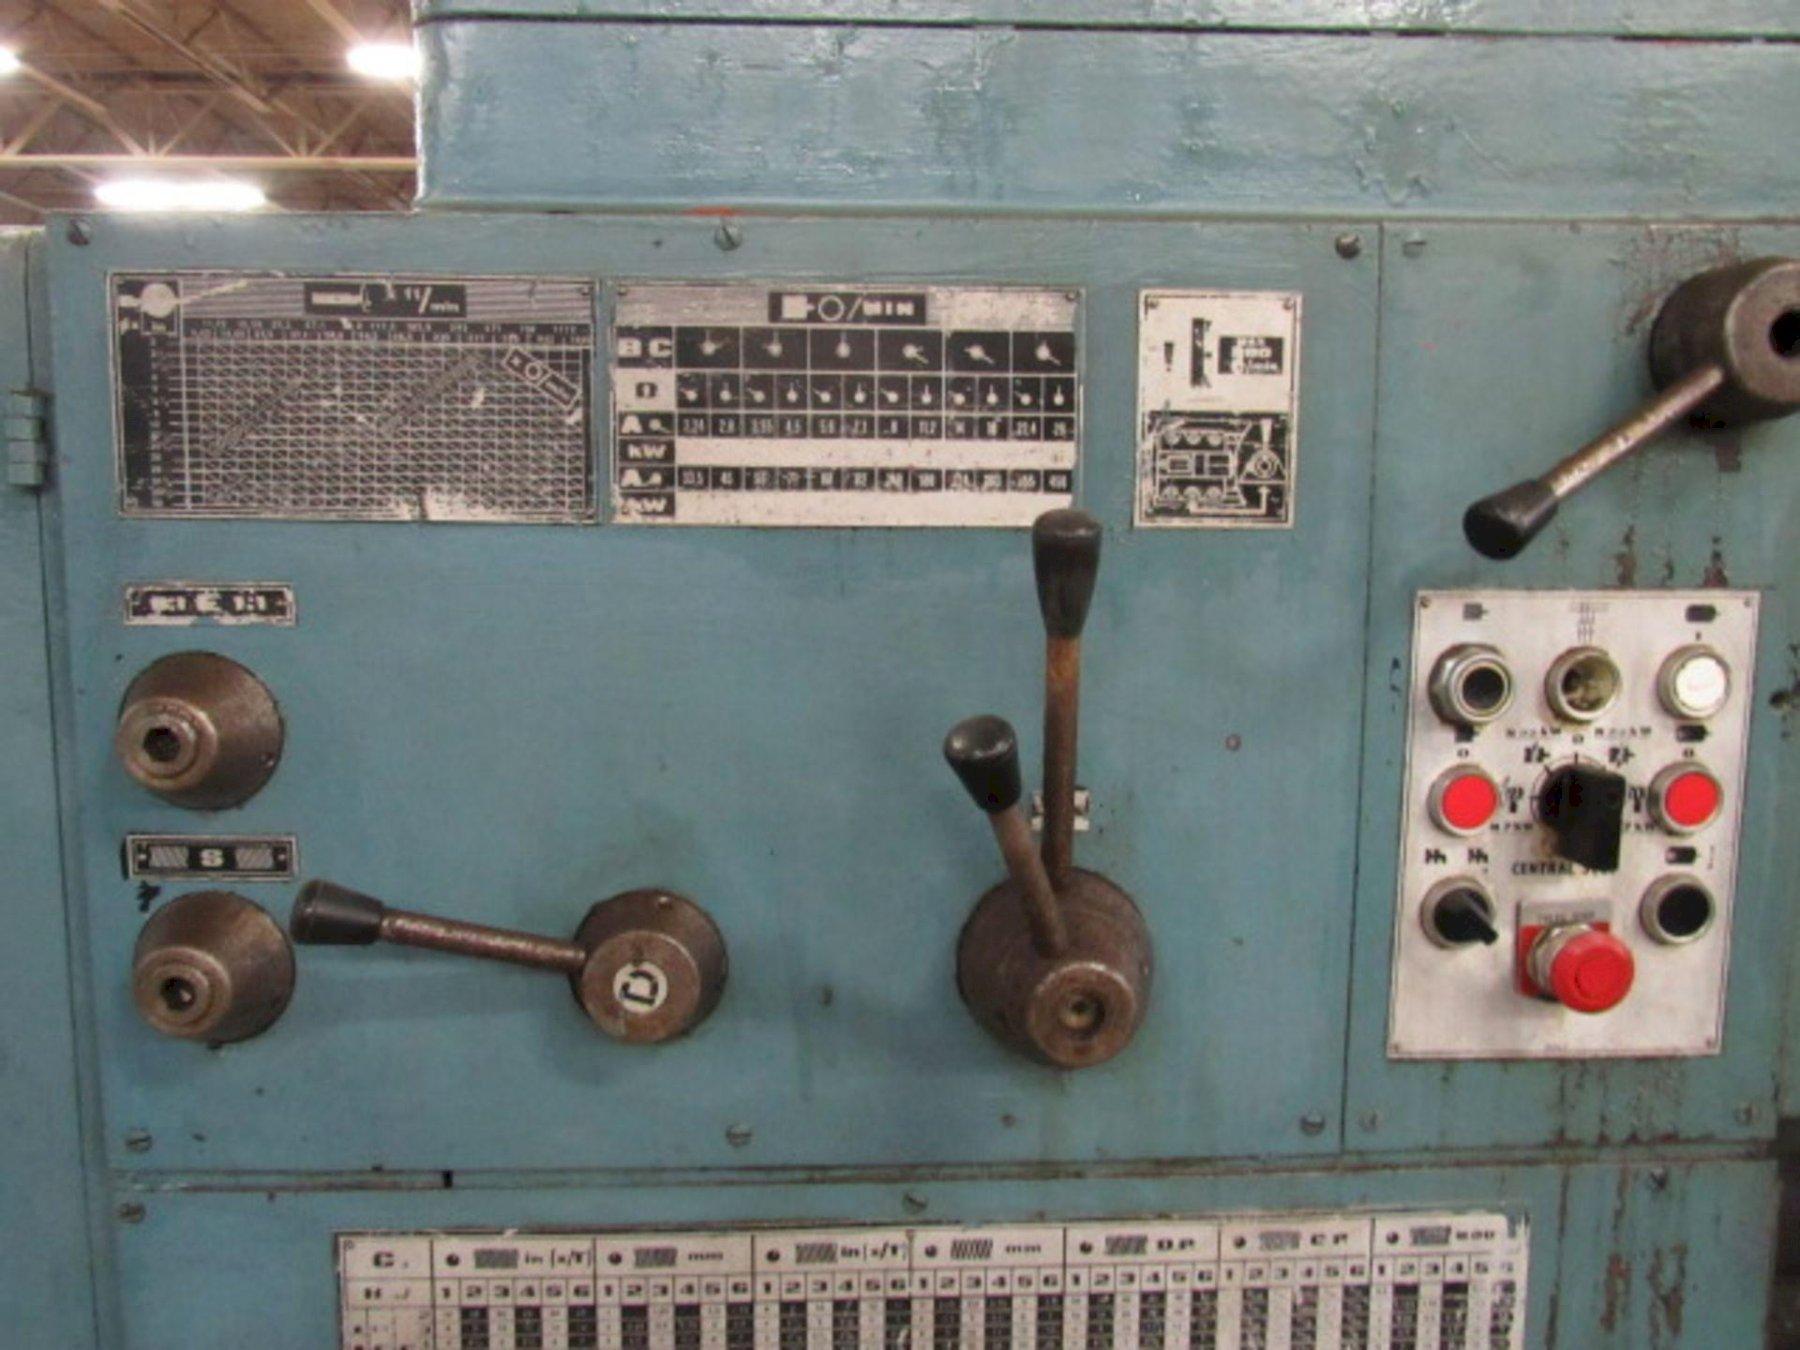 "30"" X 220"" TOS MODEL #SU100 HEAVY DUTY ENGINE LATHE. STOCK # 0848121"